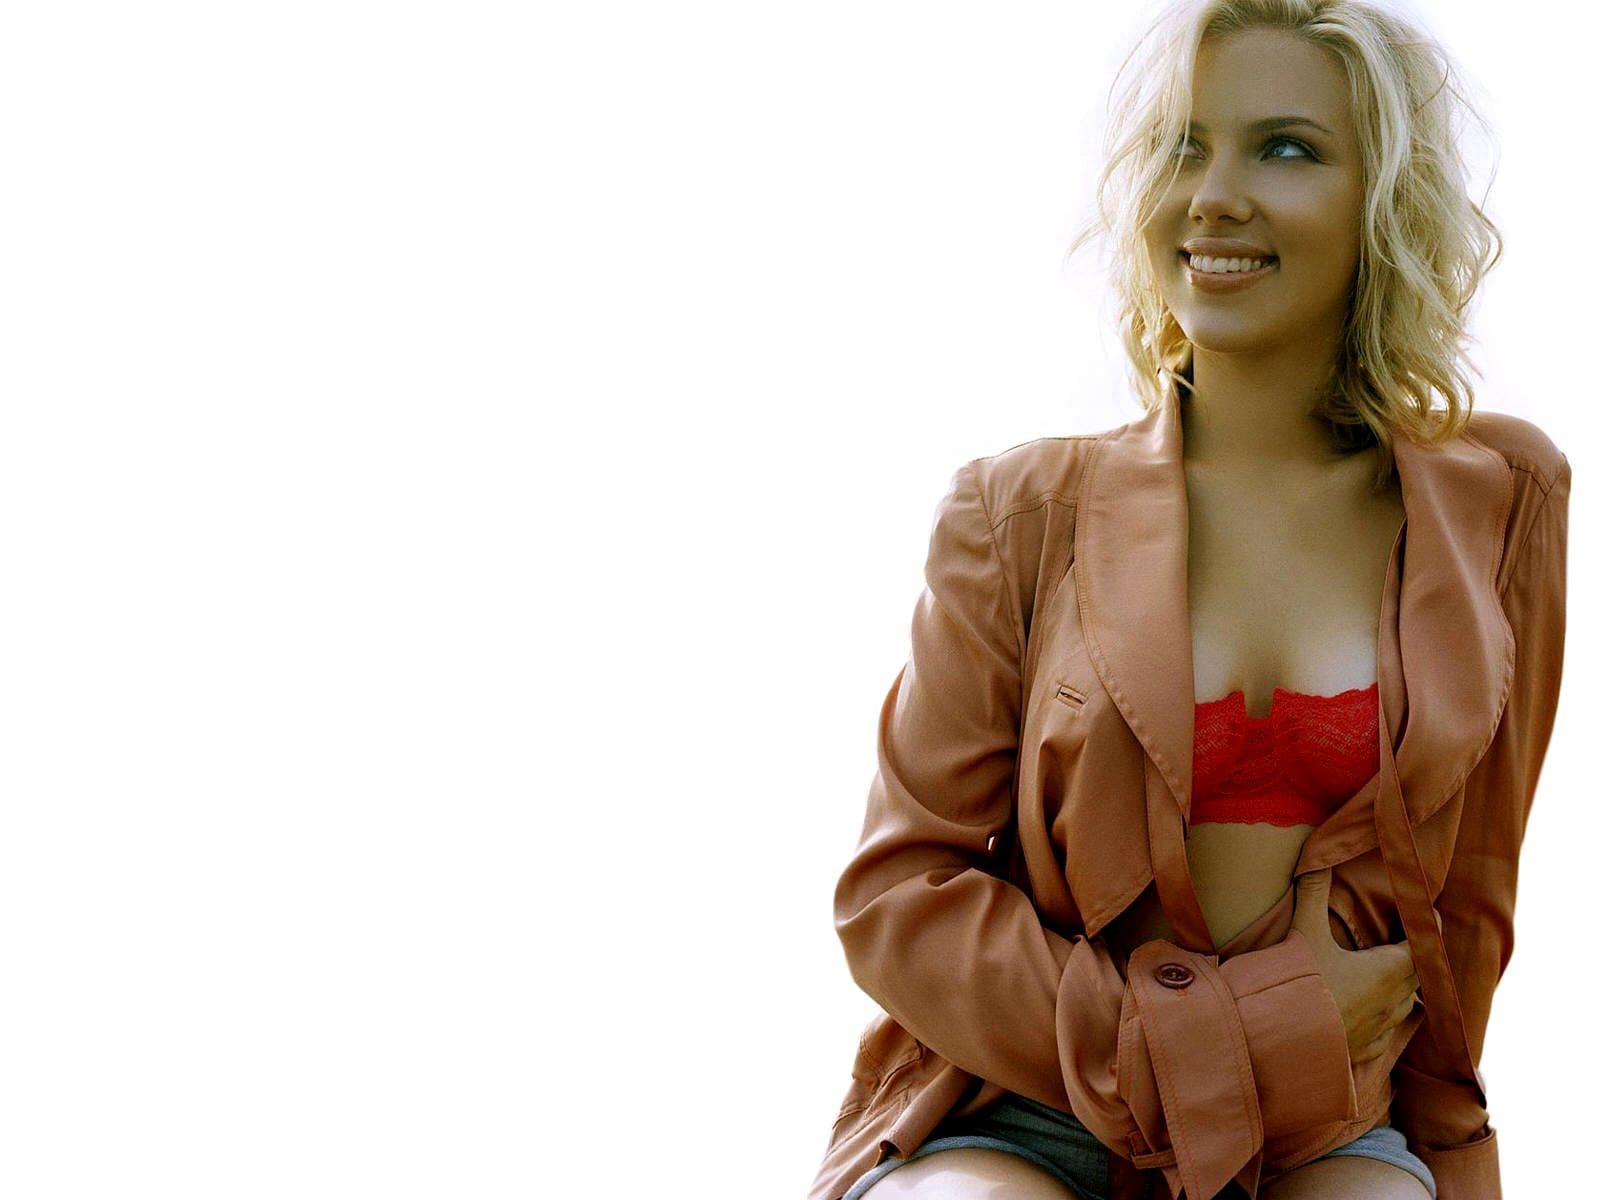 Scarlett Johansson HQ wallpapers